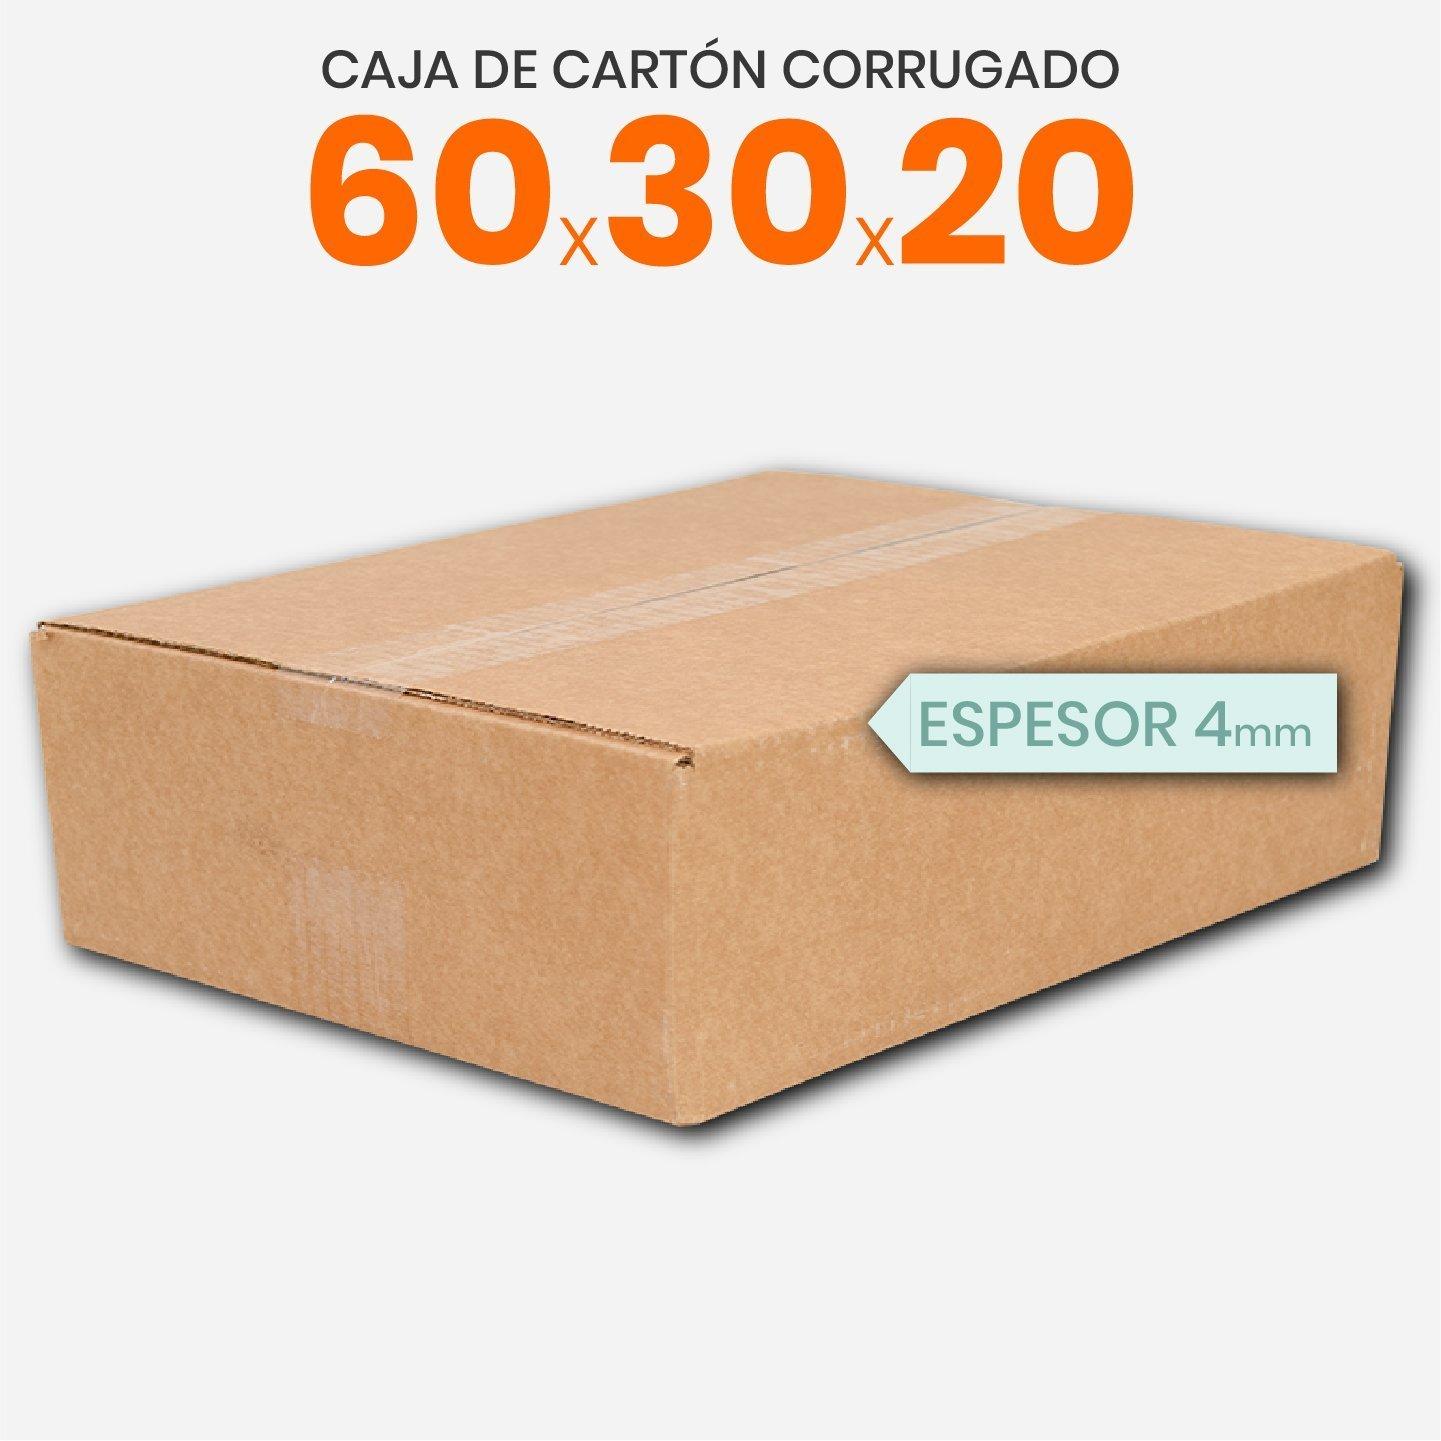 Caja De Cartón Corrugado 60x30x20 4mm